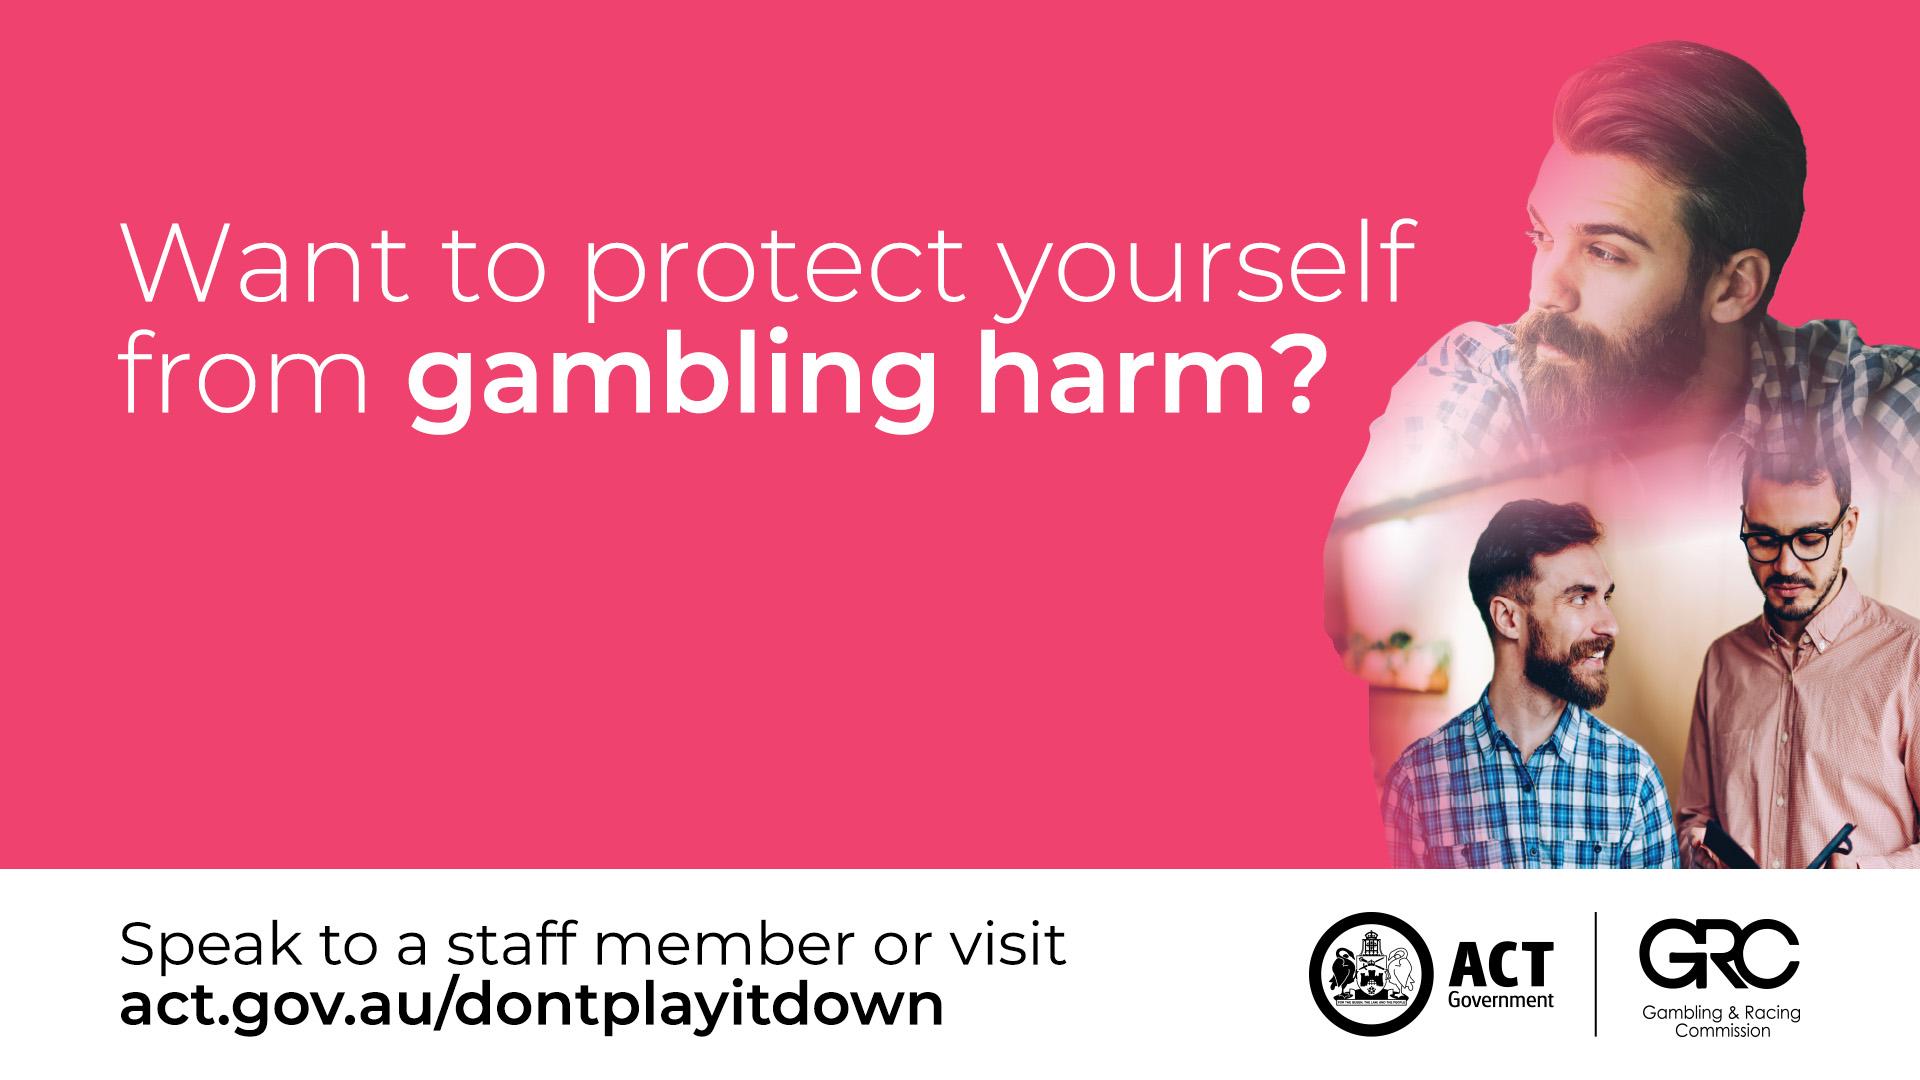 GRC Gambling Harm Ad Hide Play 1920x1080